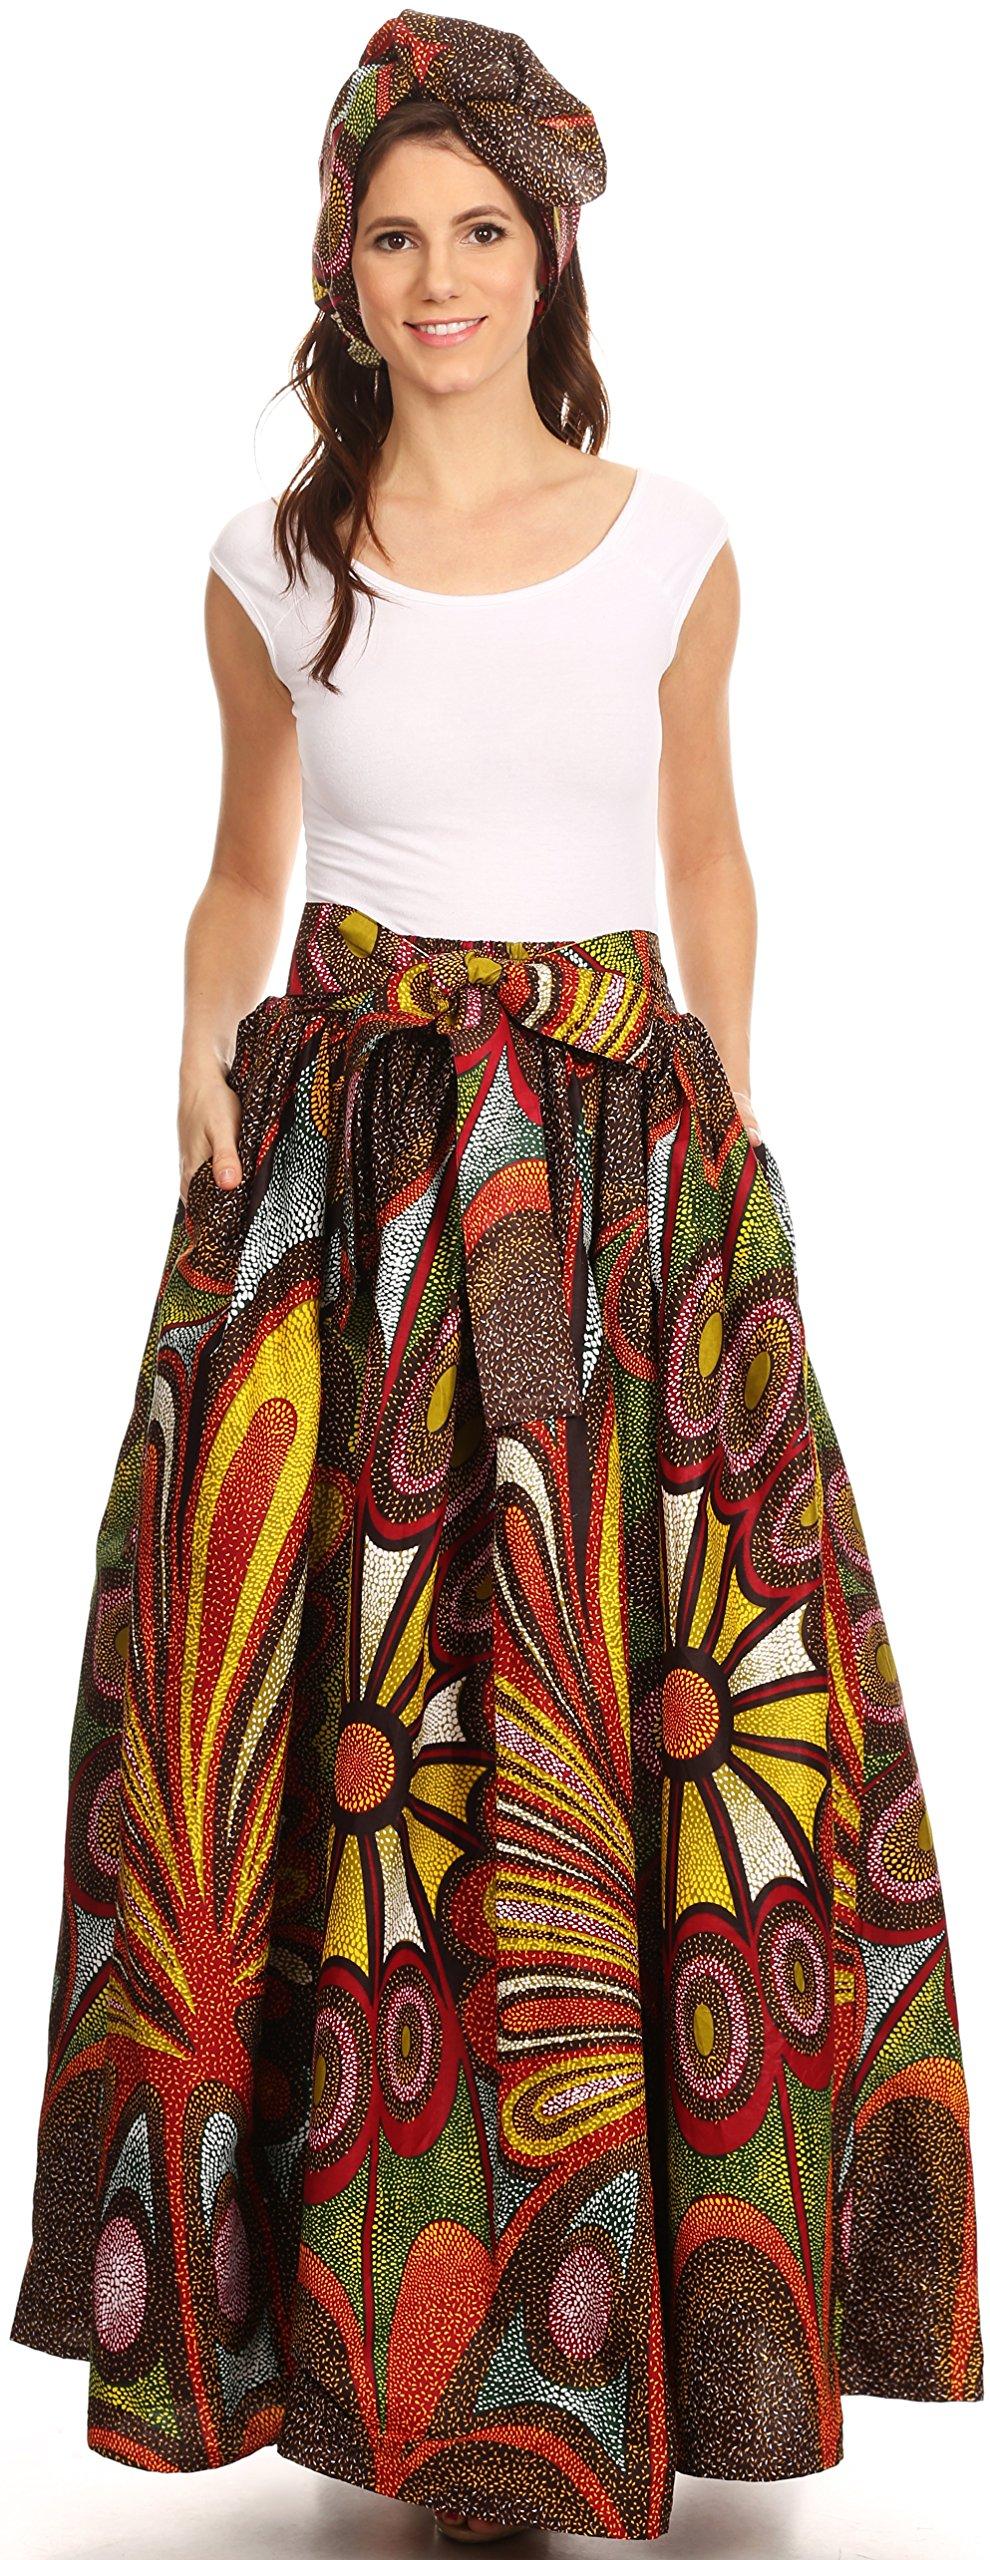 Sakkas 16317 - Asma Convertible Traditional Wax Print Adjustable Strap Maxi Skirt | Dress - 501-Multi - OS